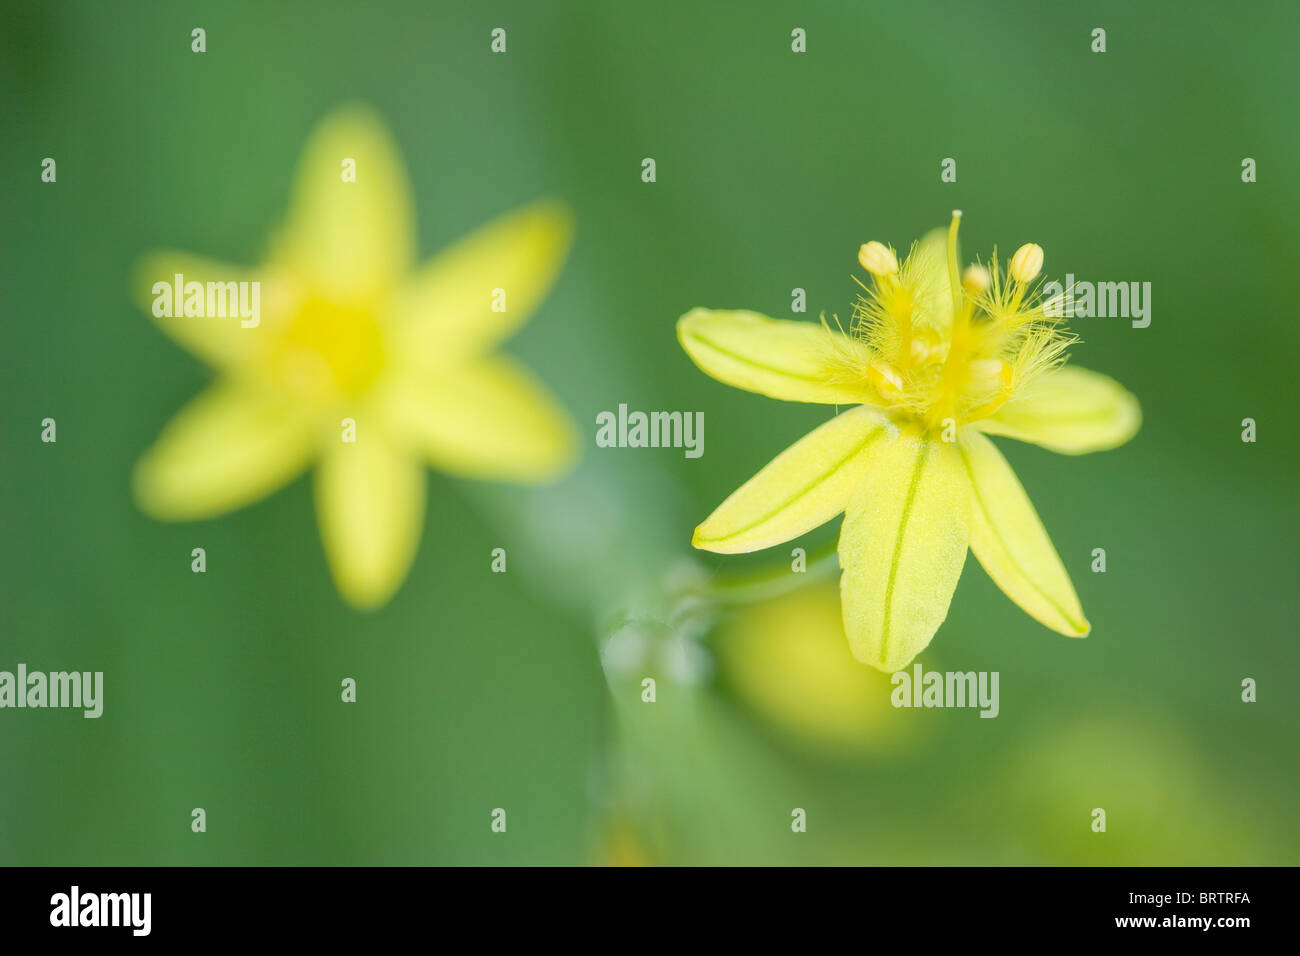 Forme de fleur jaune,Bulbine frutescens en macro avec bon fond vert Photo Stock